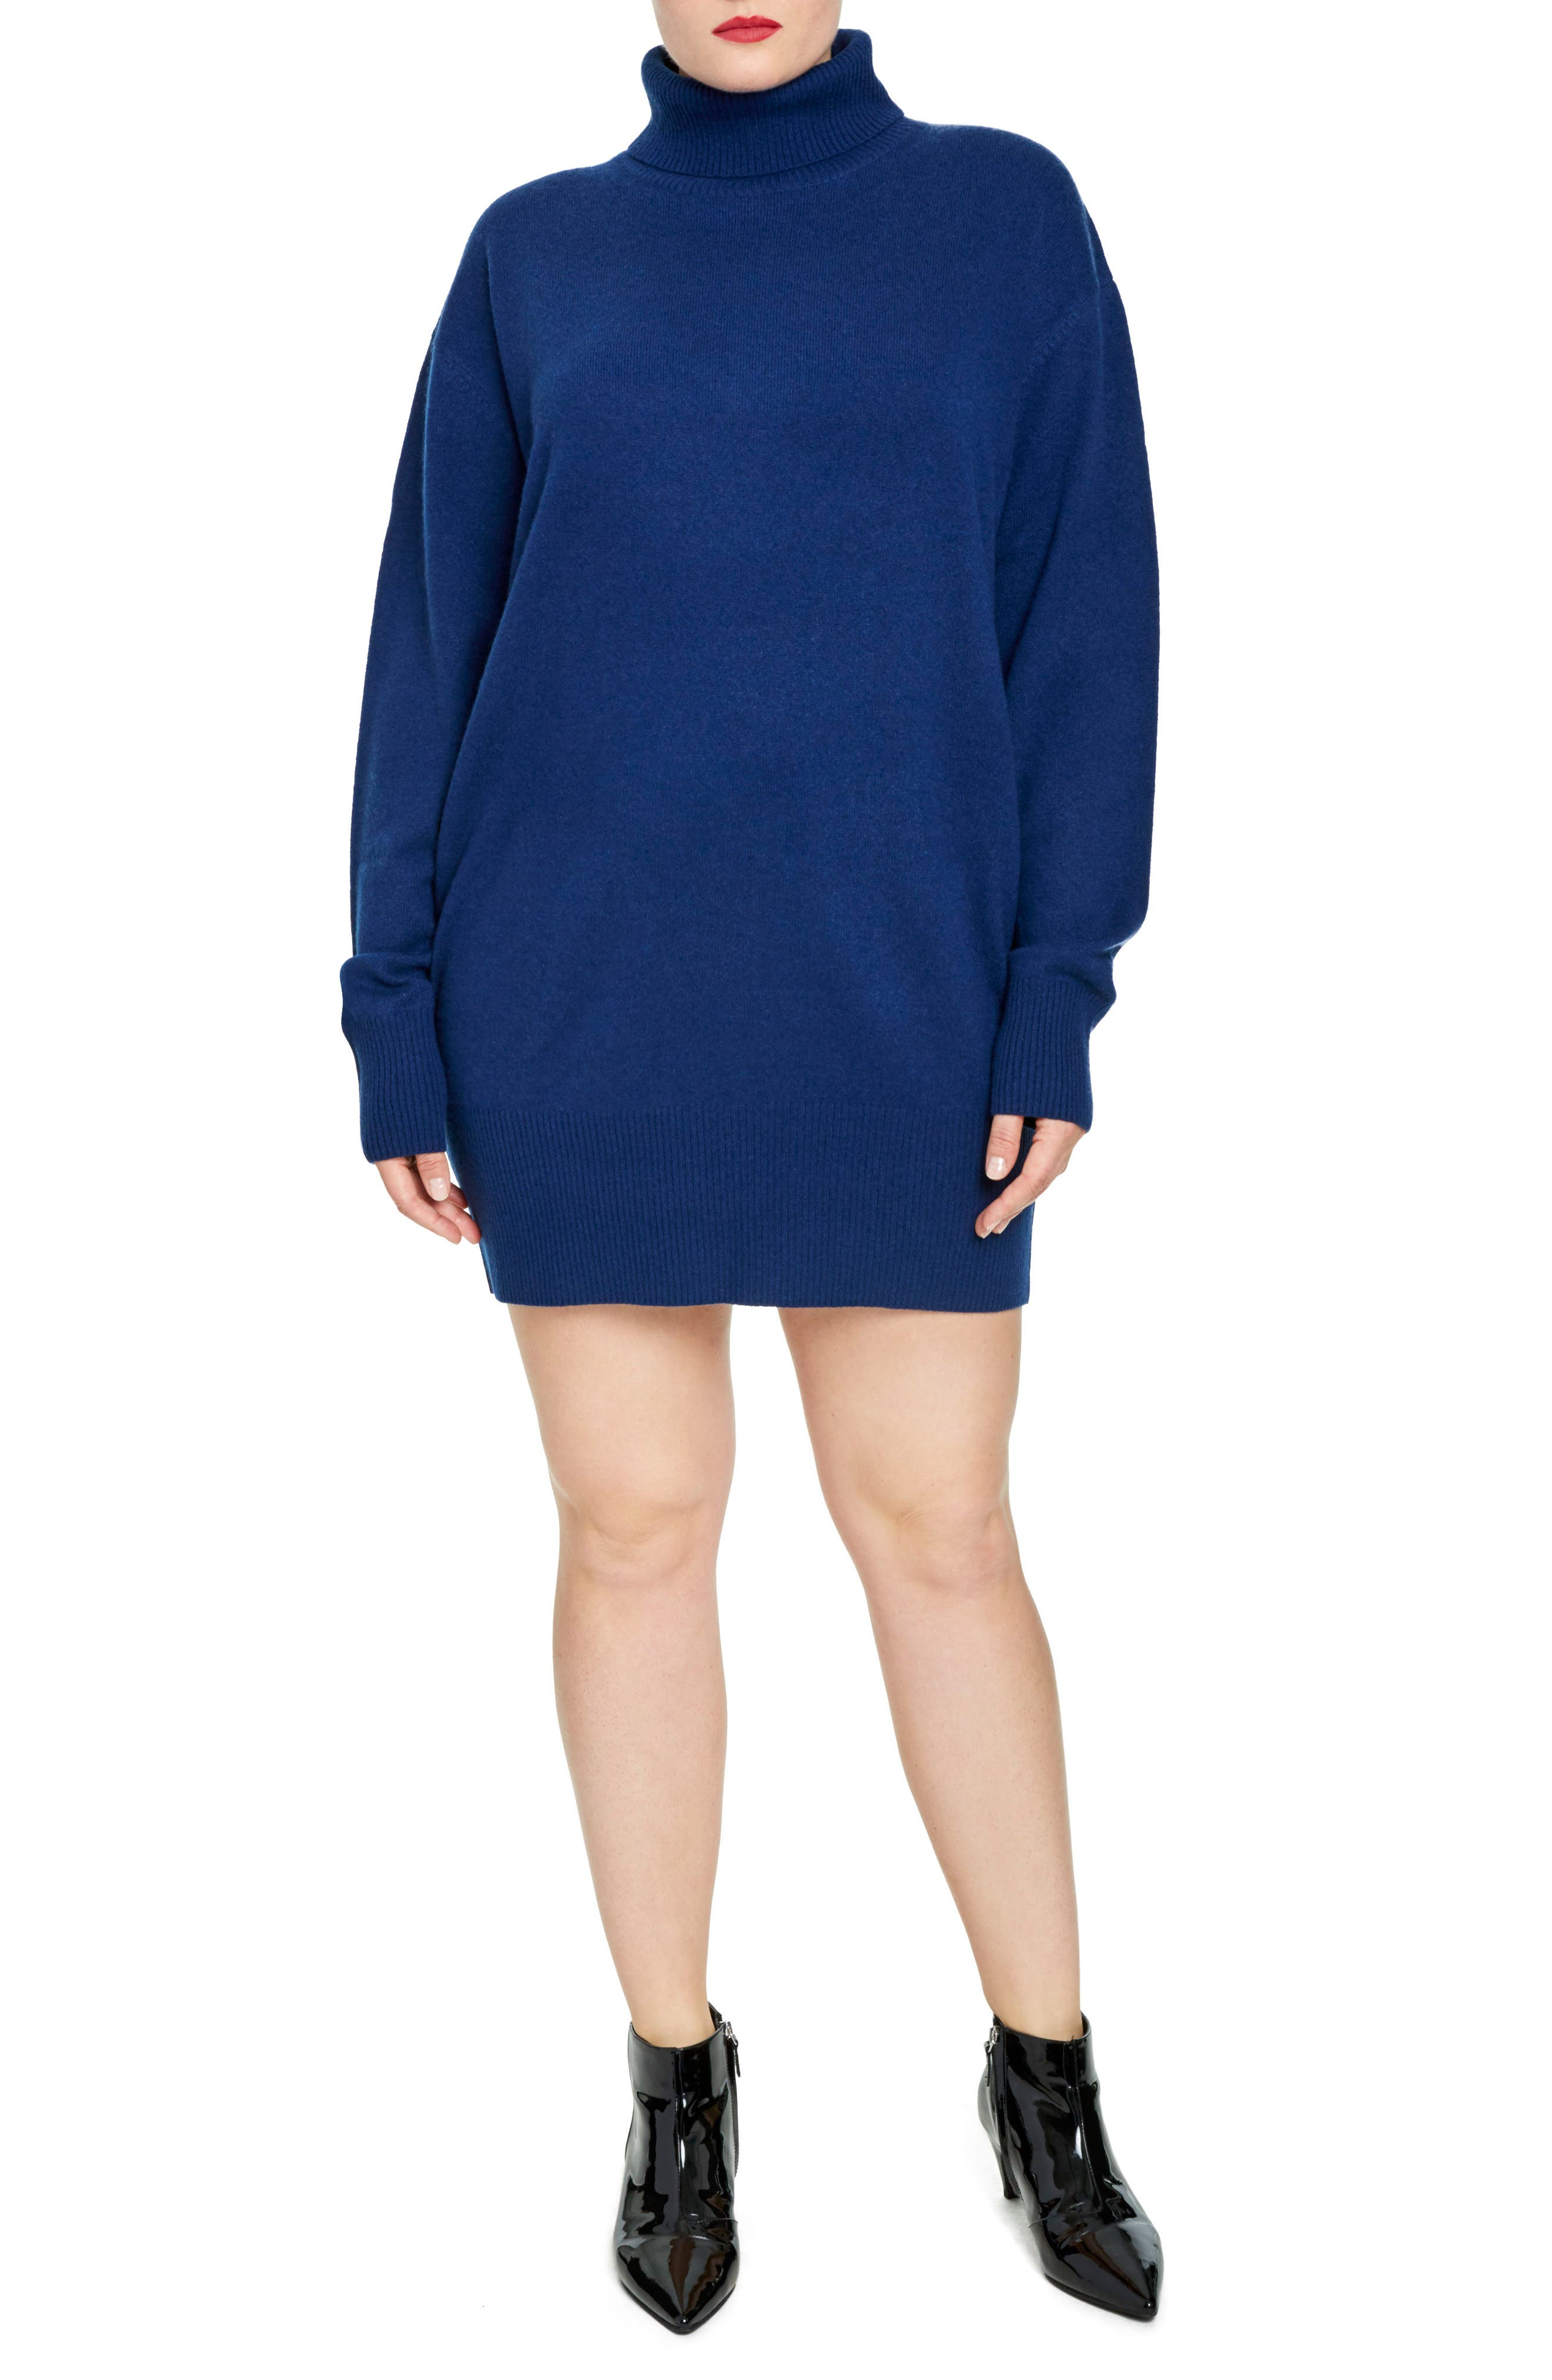 UNIVERSAL STANDARD Wheaton Turtleneck Sweater (Plus Size)